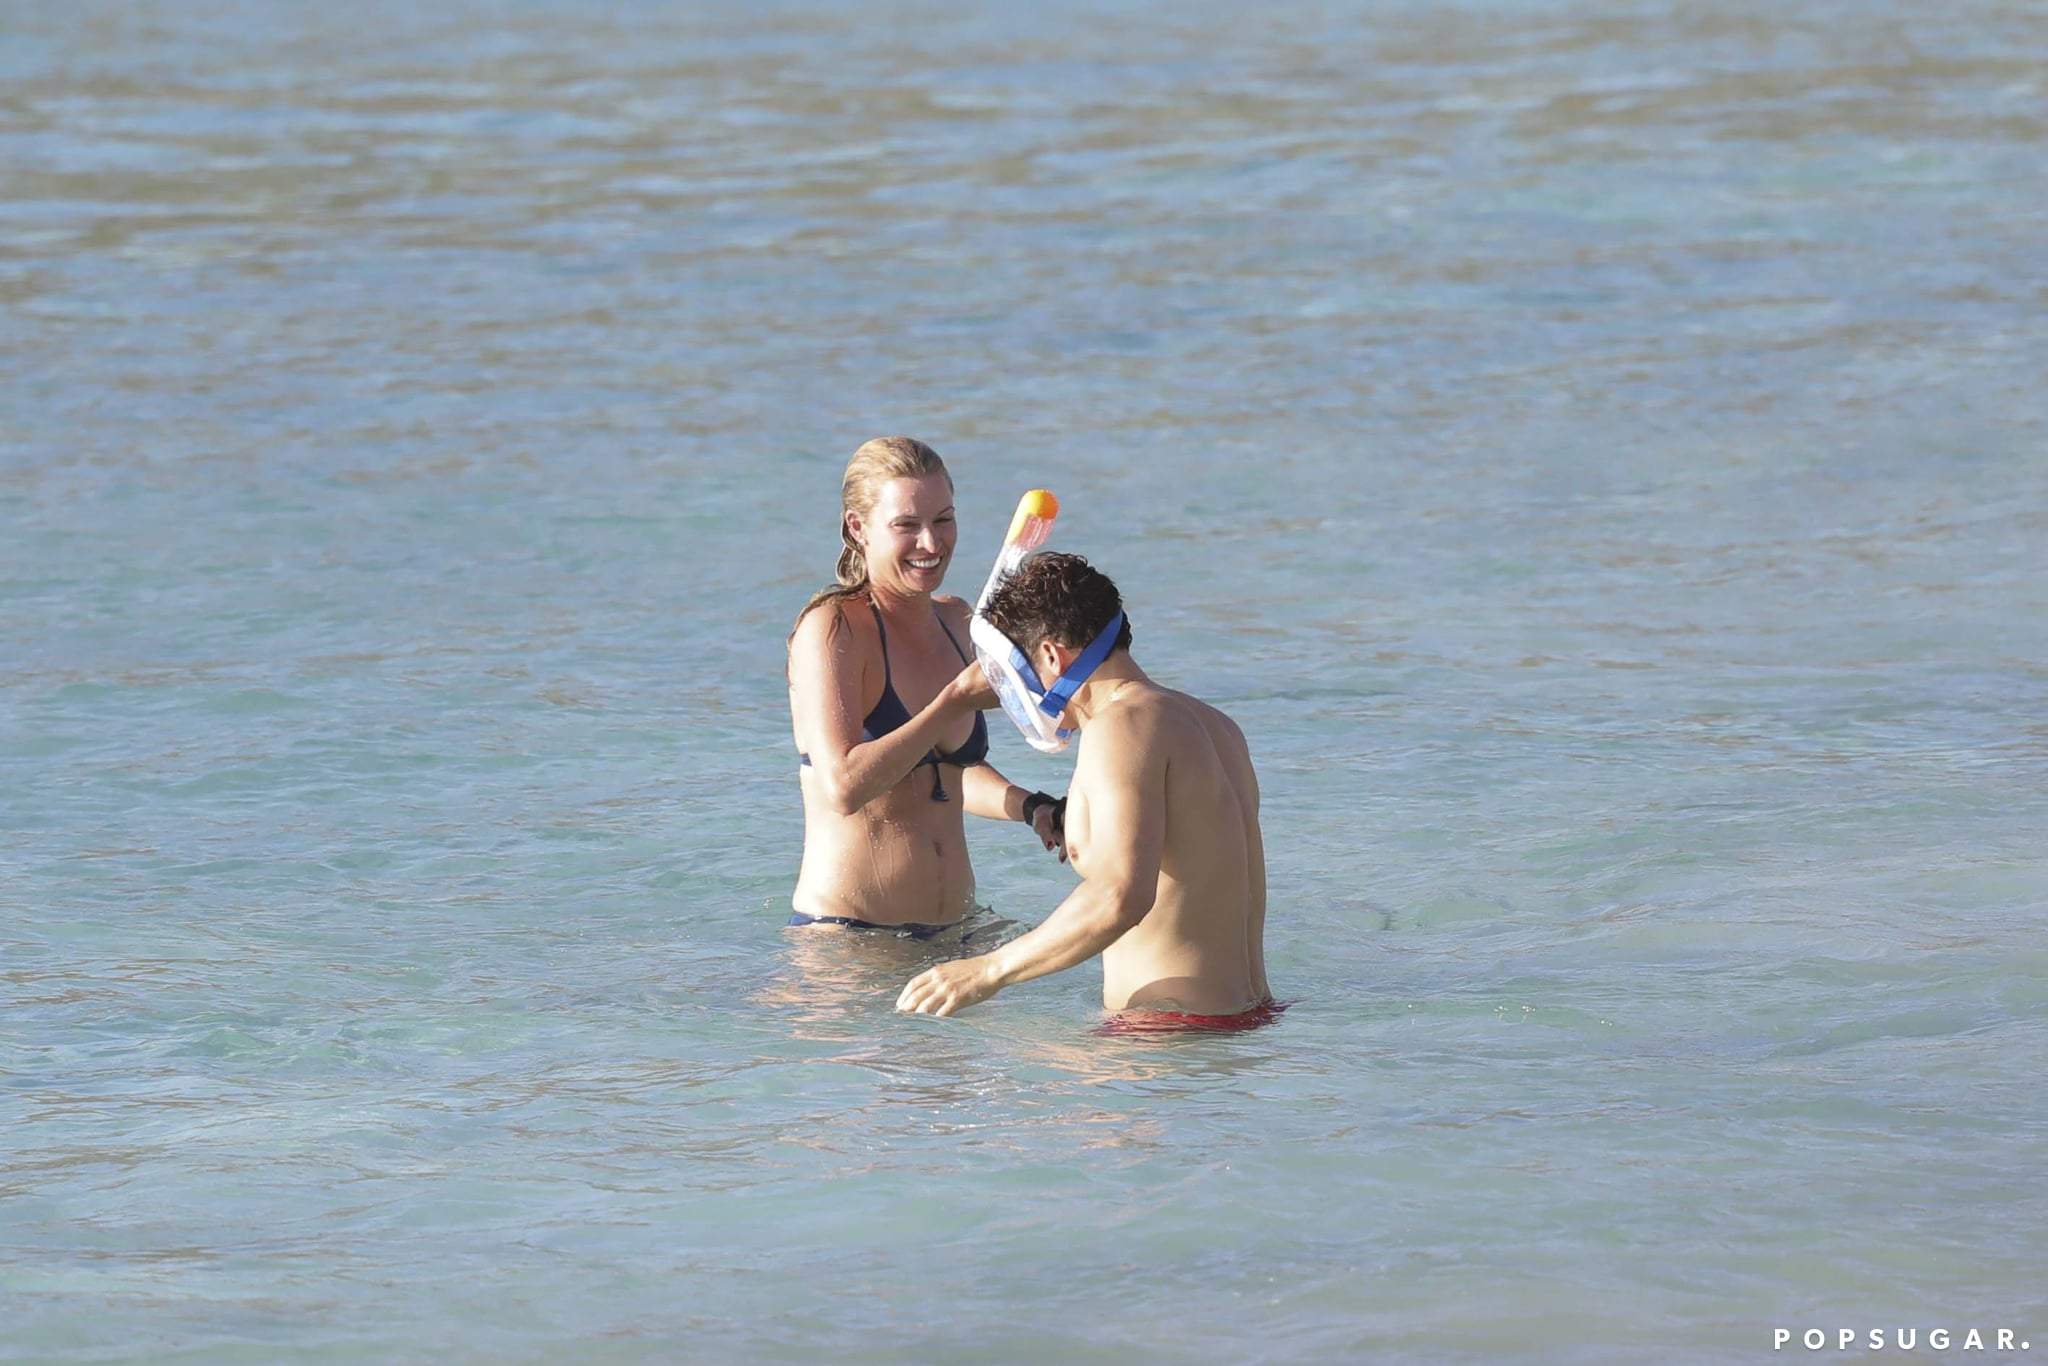 Orlando Bloom Shirtless On Vacation In St Barts March 2017 Popsugar Celebrity